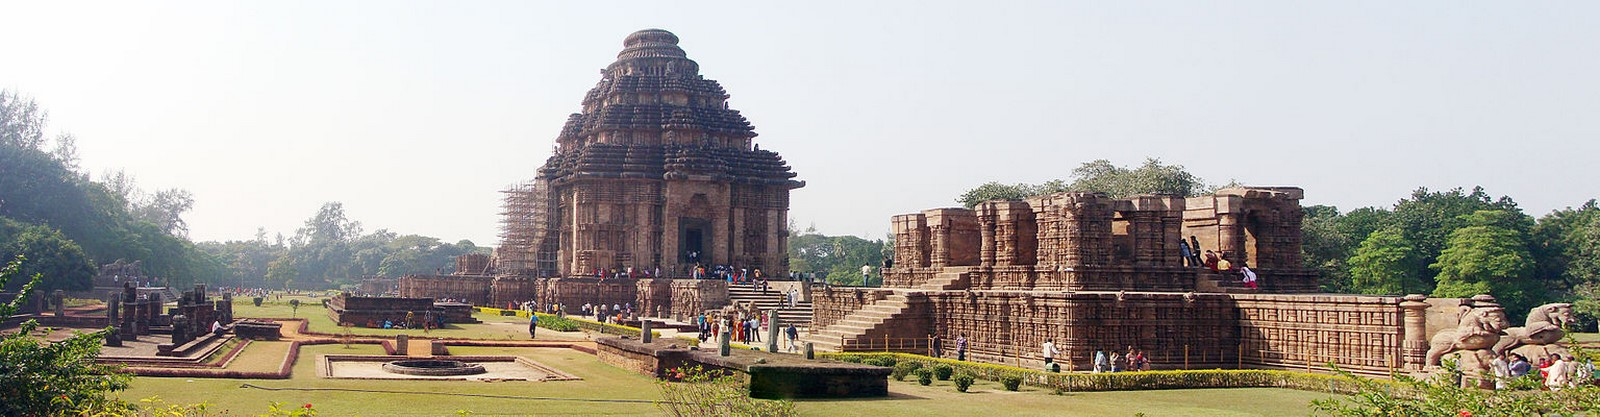 Konark Sun Temple Complex, Konark, Puri, Odisha, India. - Sheet1